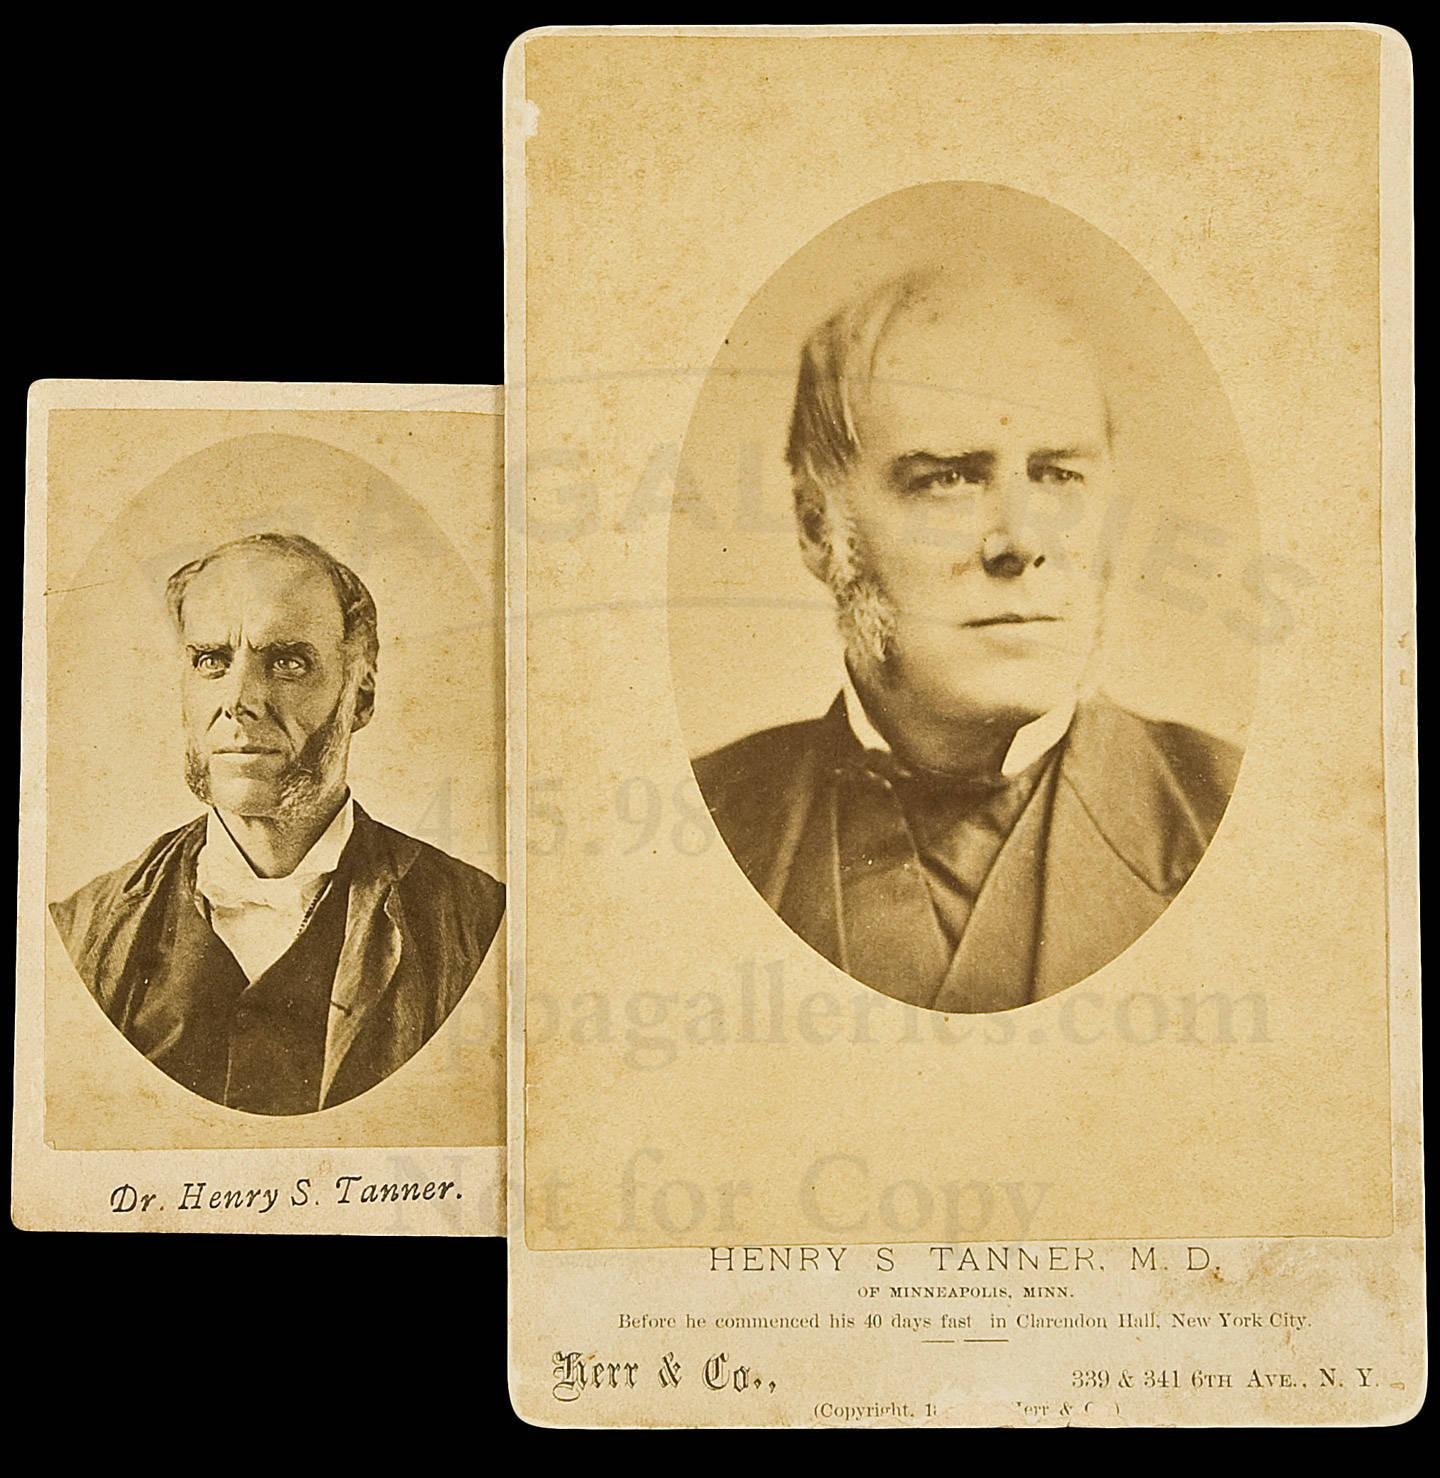 A Cabinet Card And Carte De Visite Of Famed Faster Dr Henry S